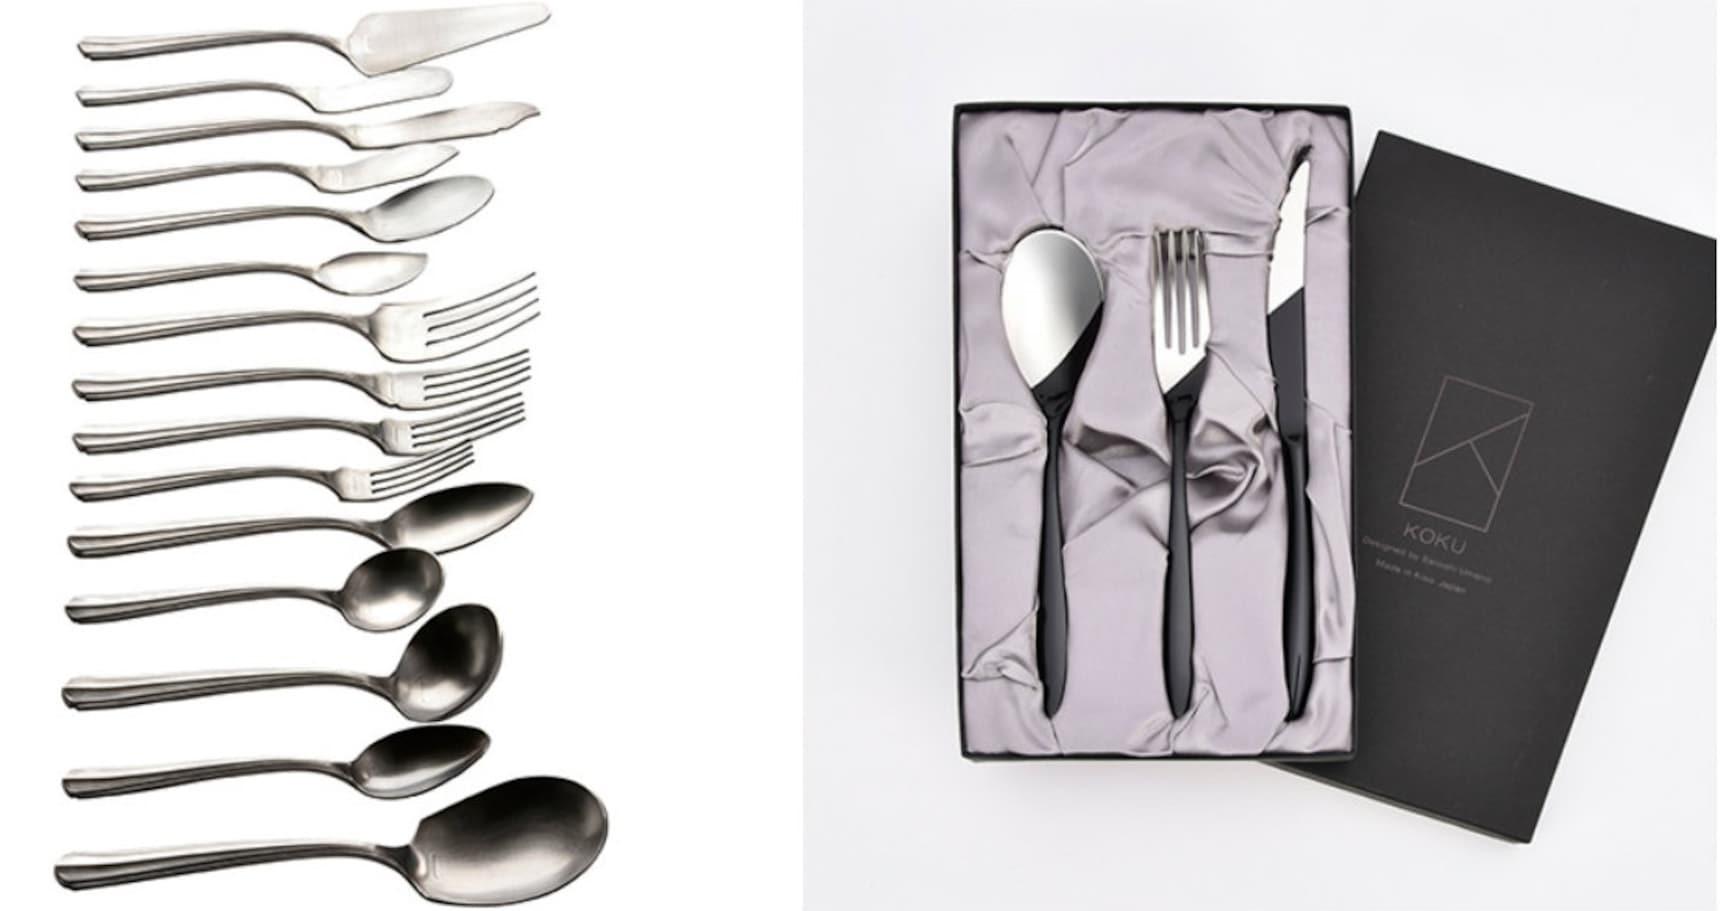 4 Beautiful Cutlery Sets